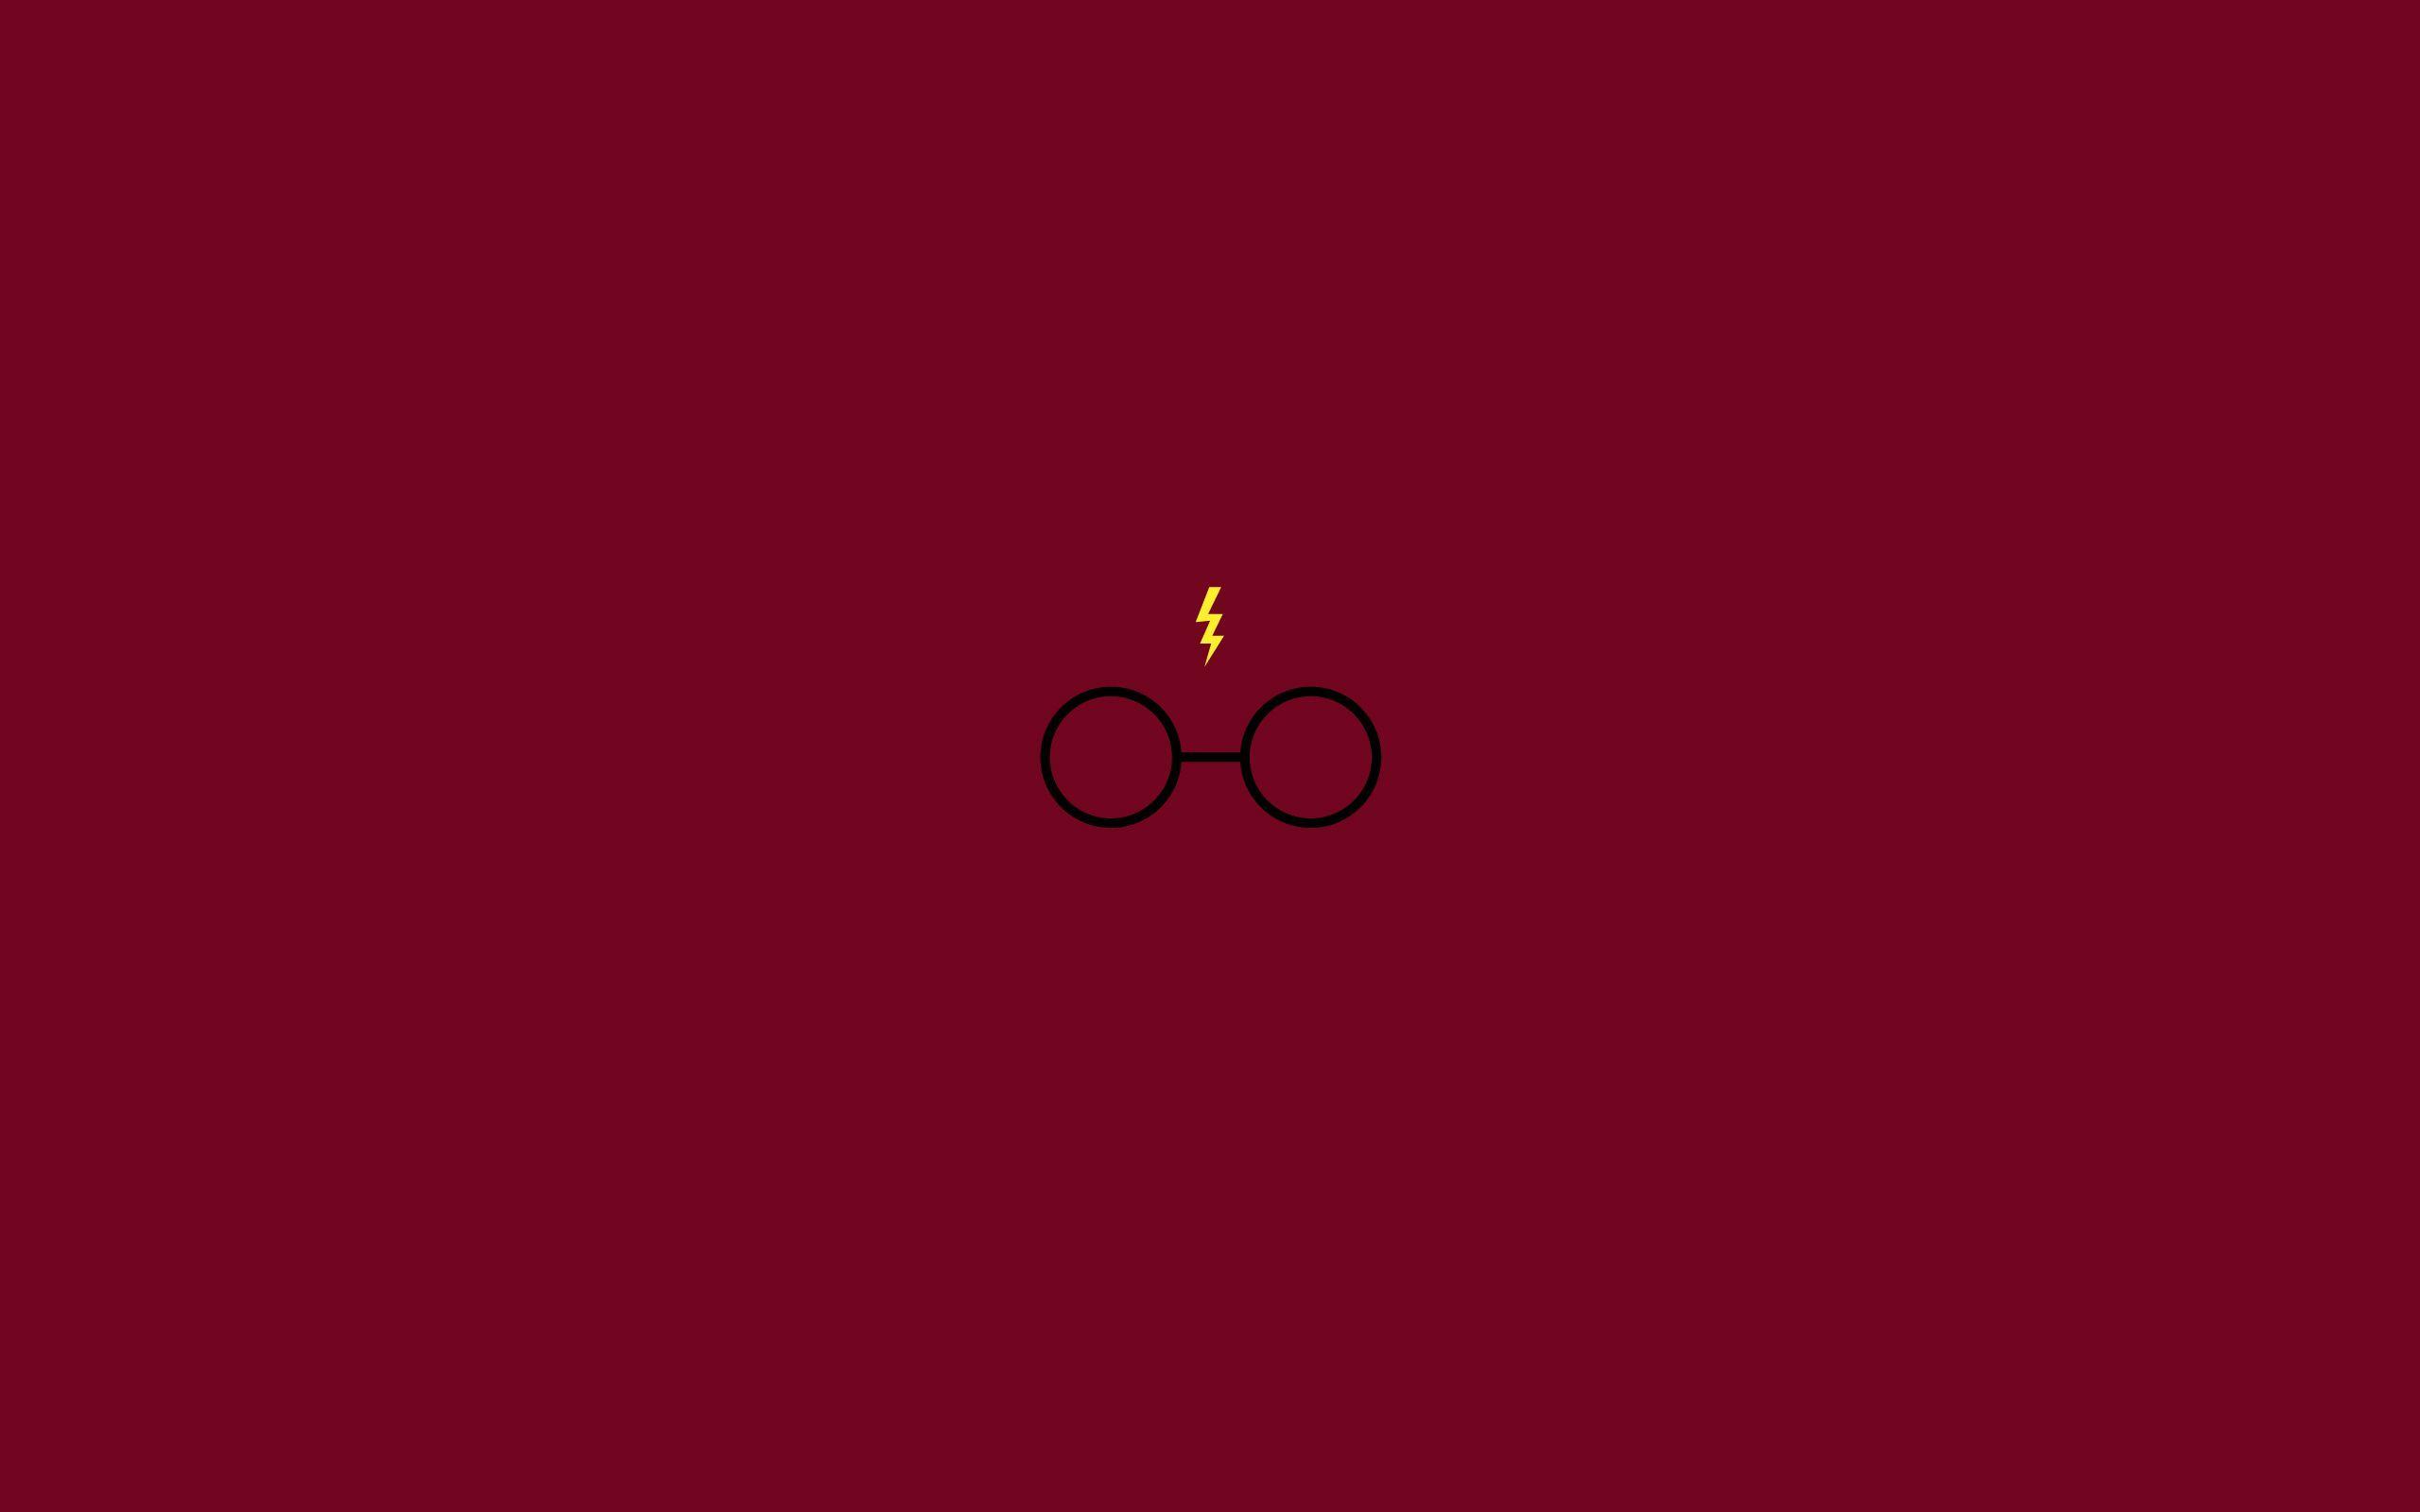 Minimalist Harry Potter Wallpapers Top Free Minimalist